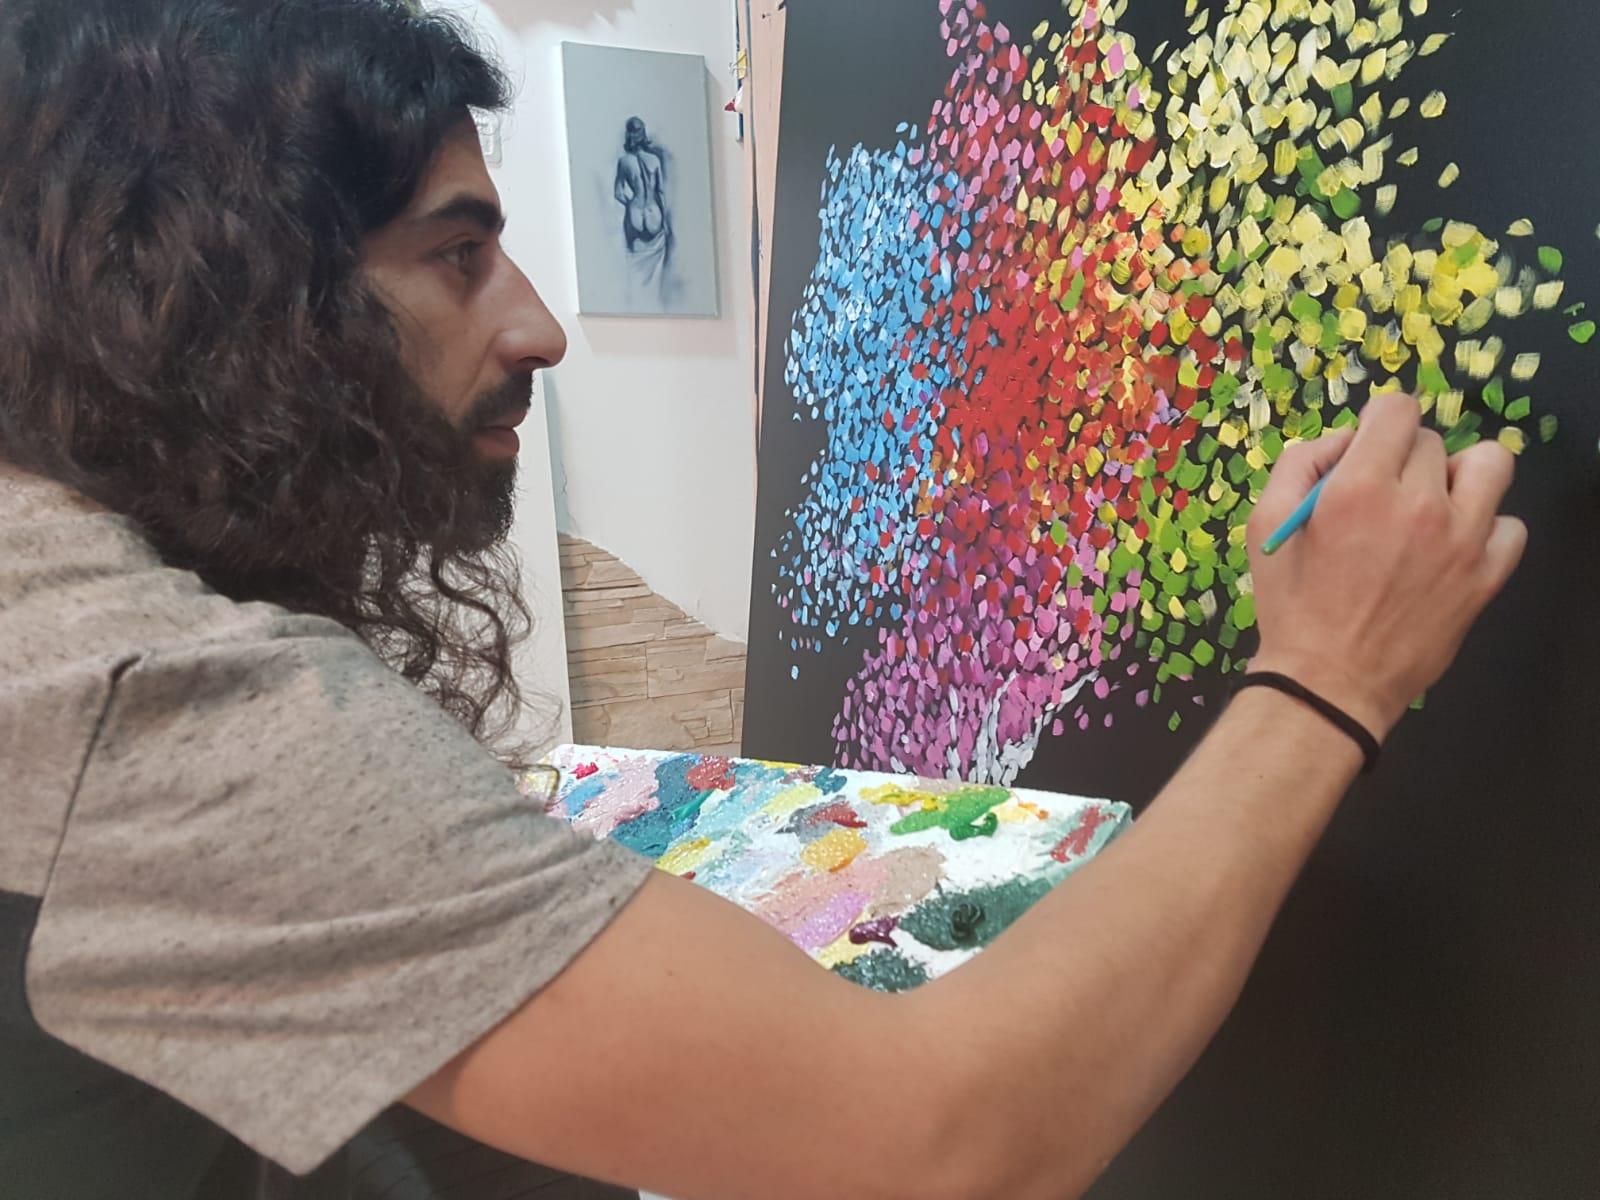 Ron deri - Abstract art creating process